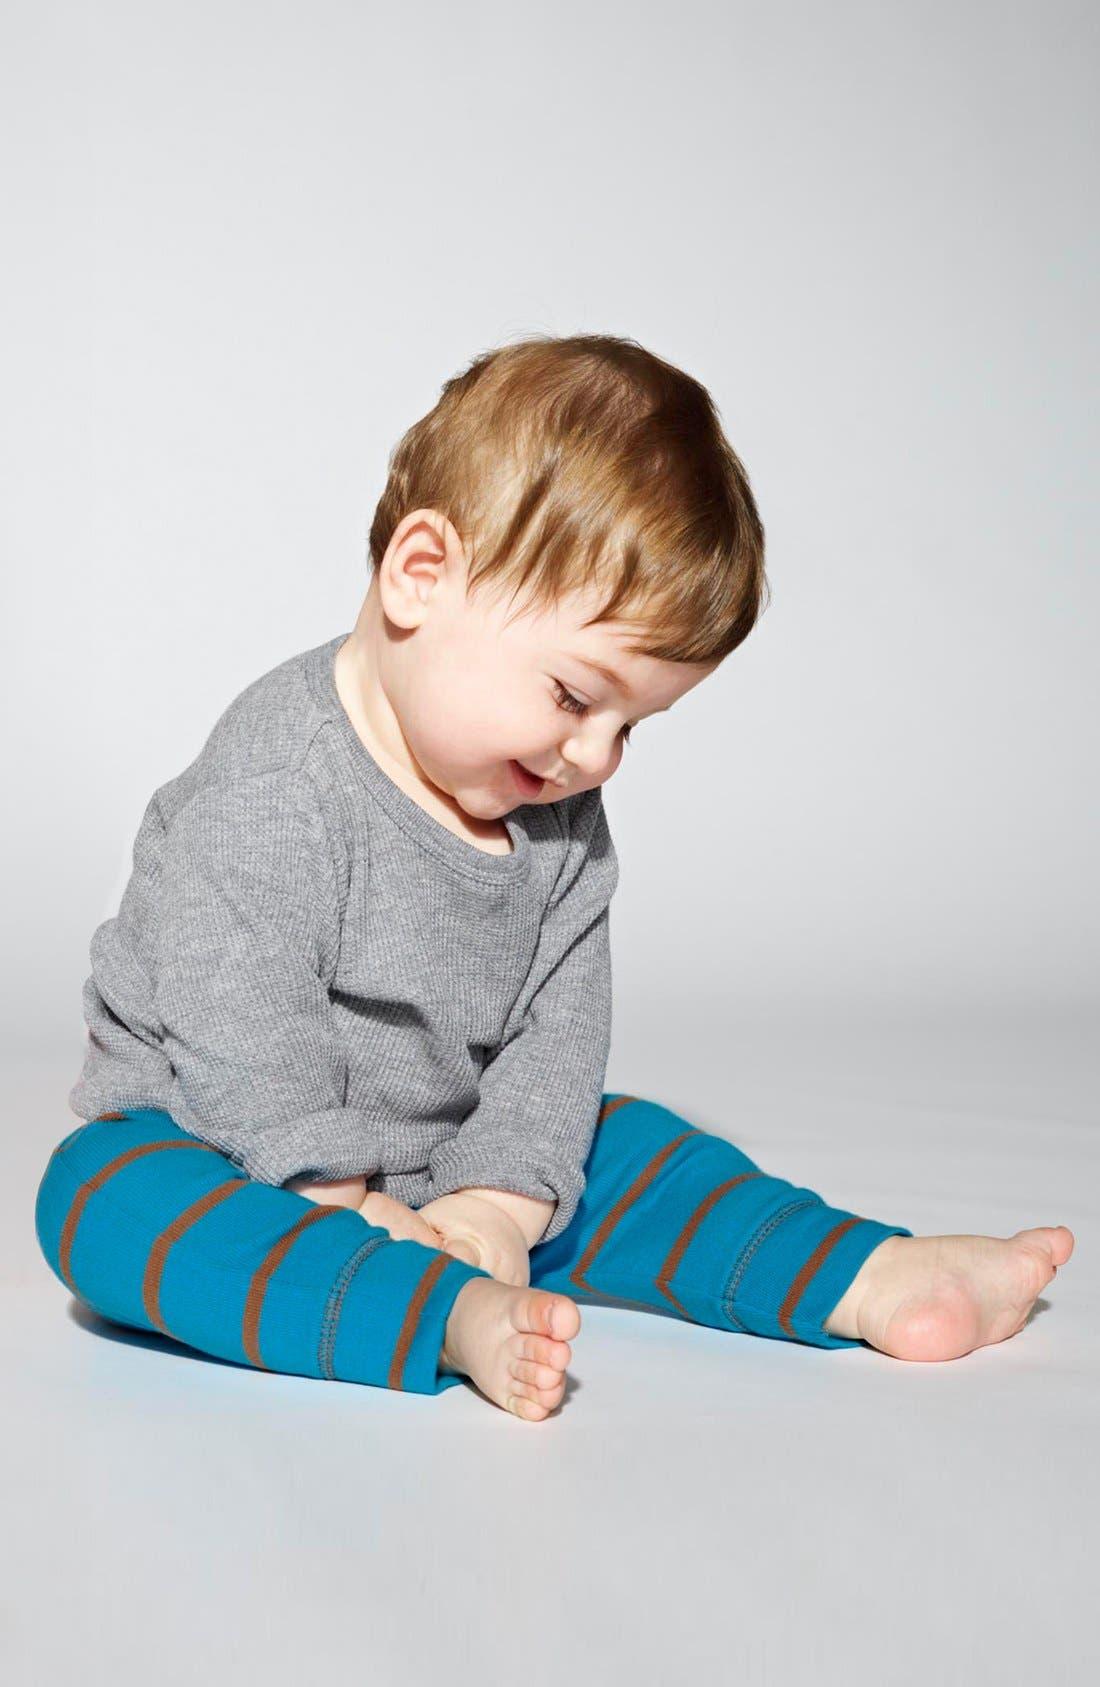 Alternate Image 1 Selected - Stem Baby Cardigan, Top & Pants (Baby Boys)